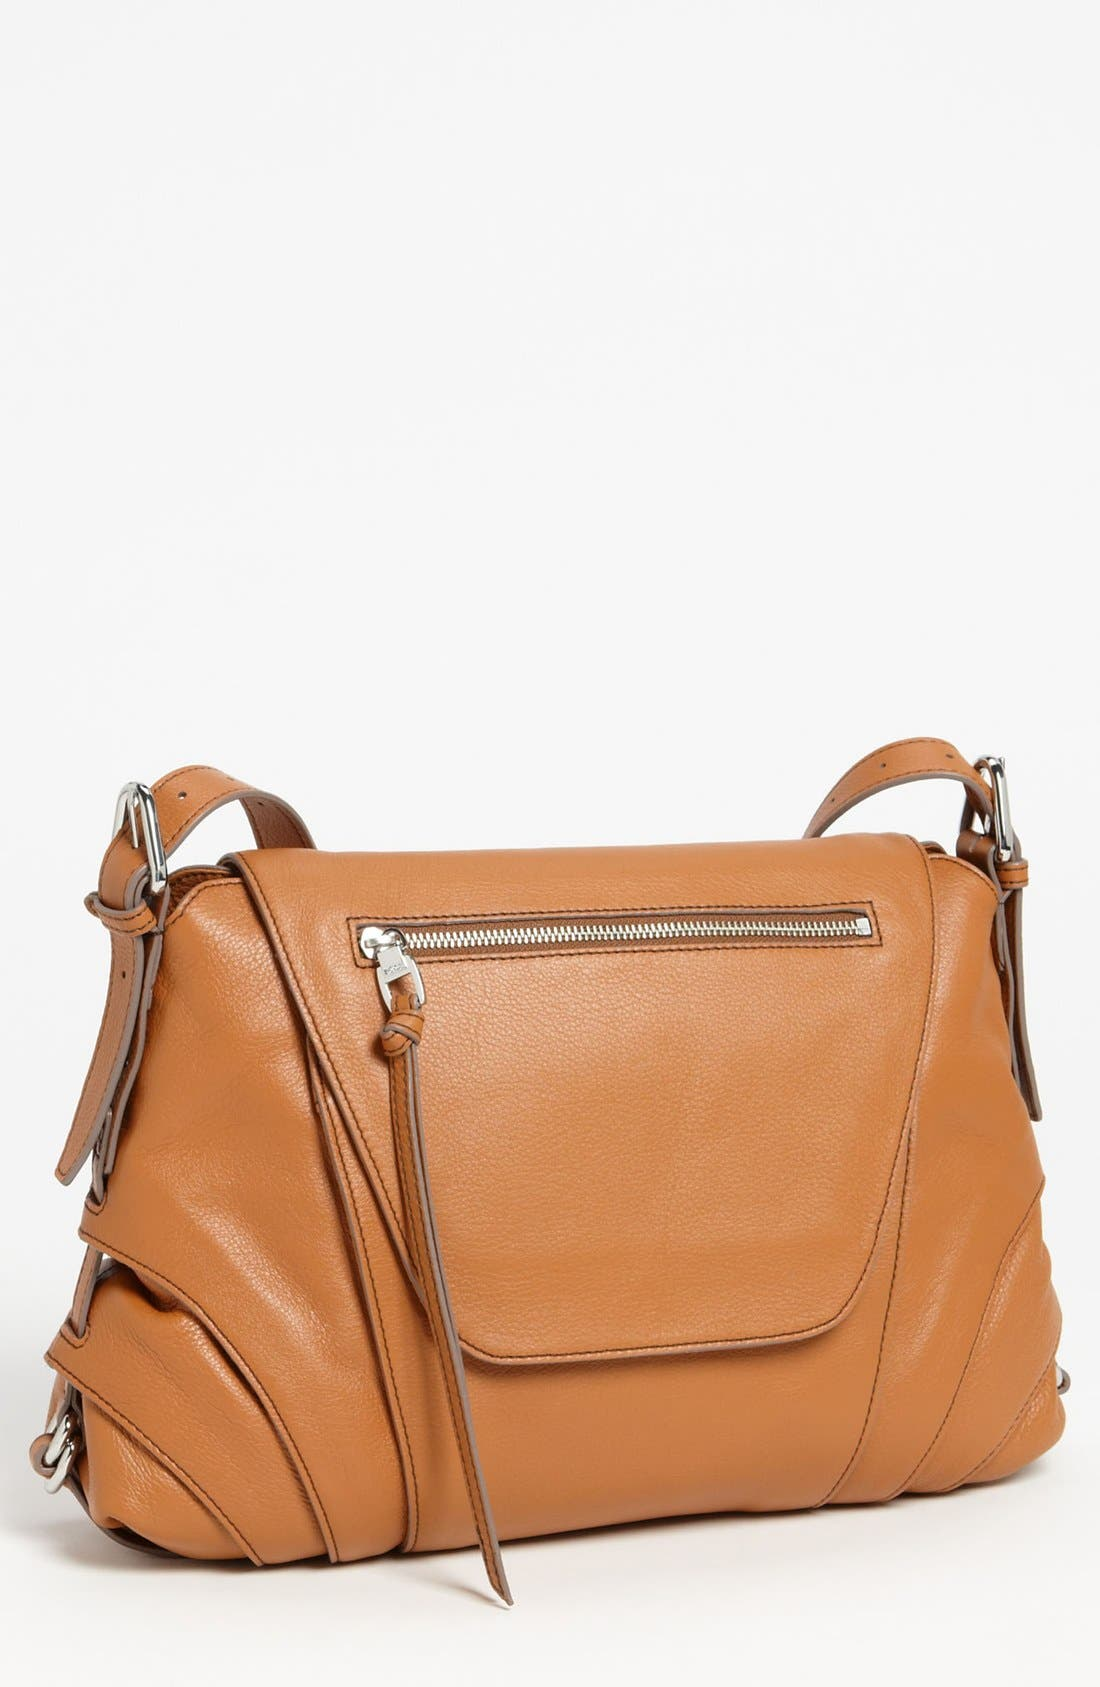 KOOBA,                             'Brielle' Leather Crossbody Bag,                             Main thumbnail 1, color,                             210